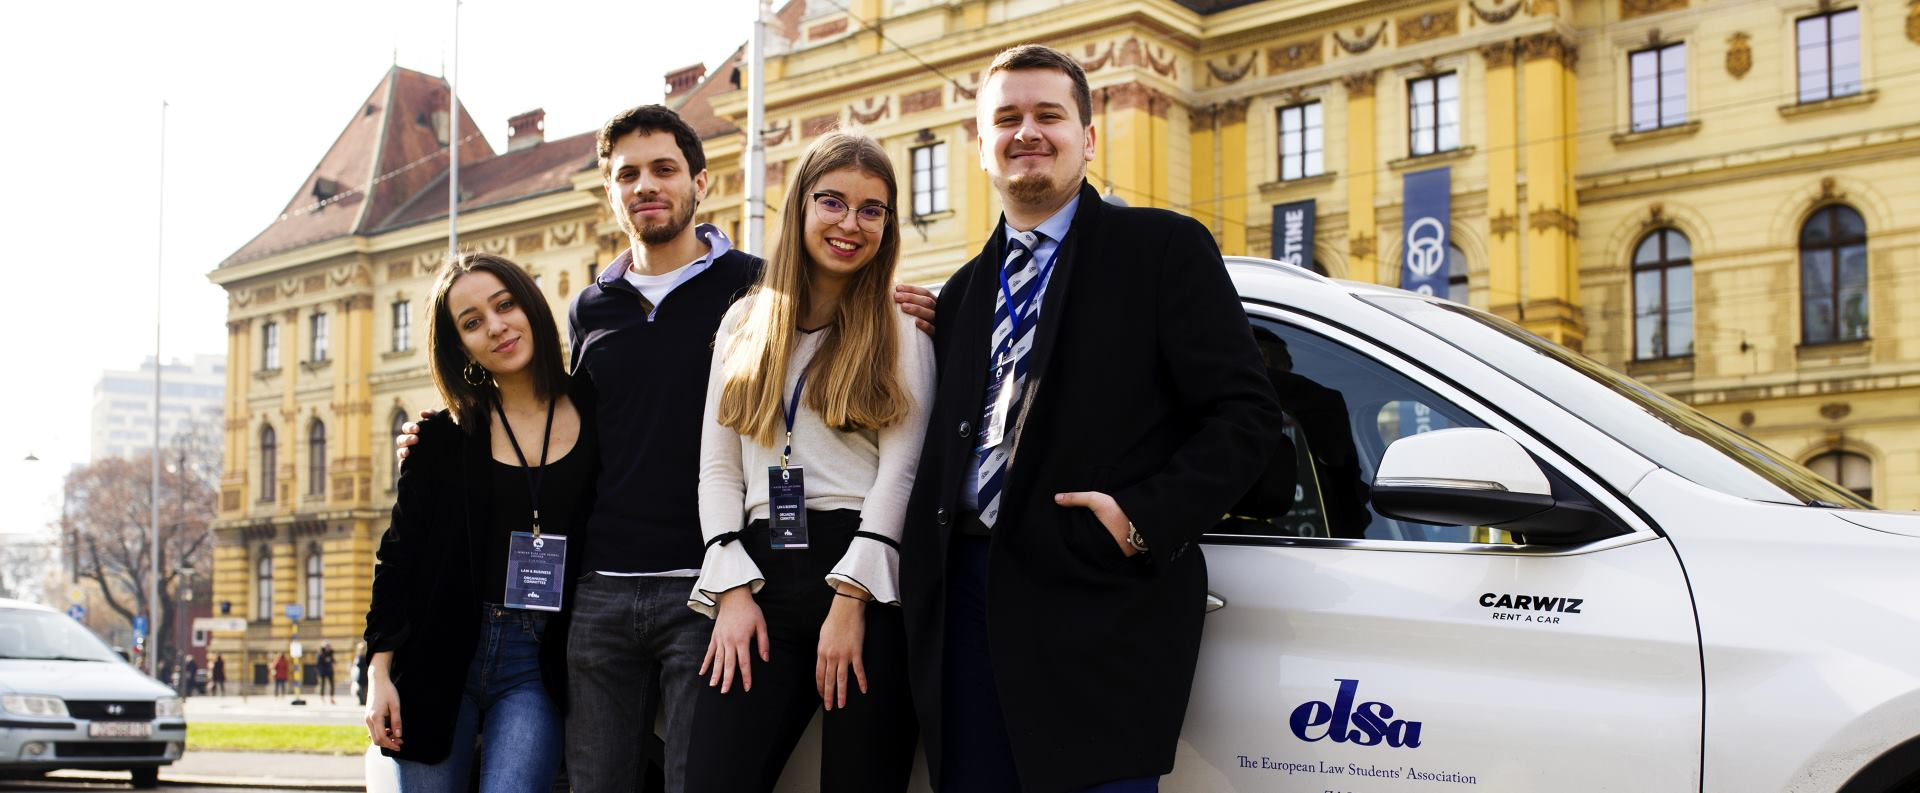 Carwiz rent a car ponosan na suradnju s ELSA-om Zagreb